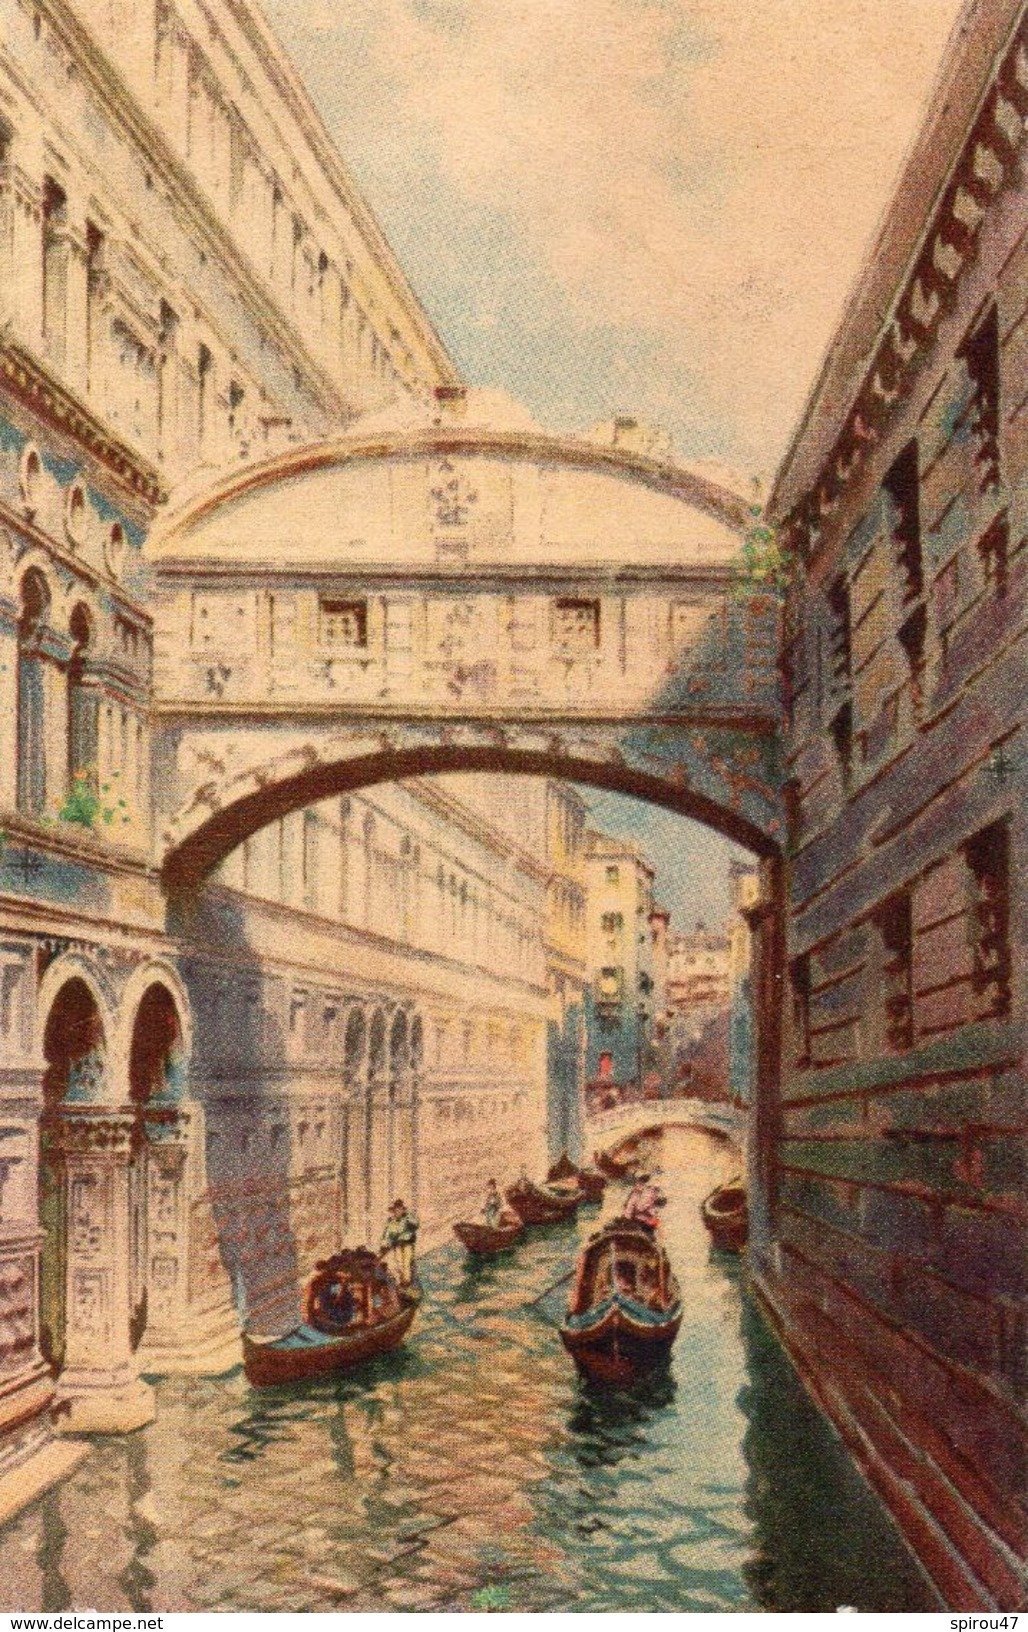 CPA VENEZIA - PONTE DEI SOSPIRI - Venezia (Venice)